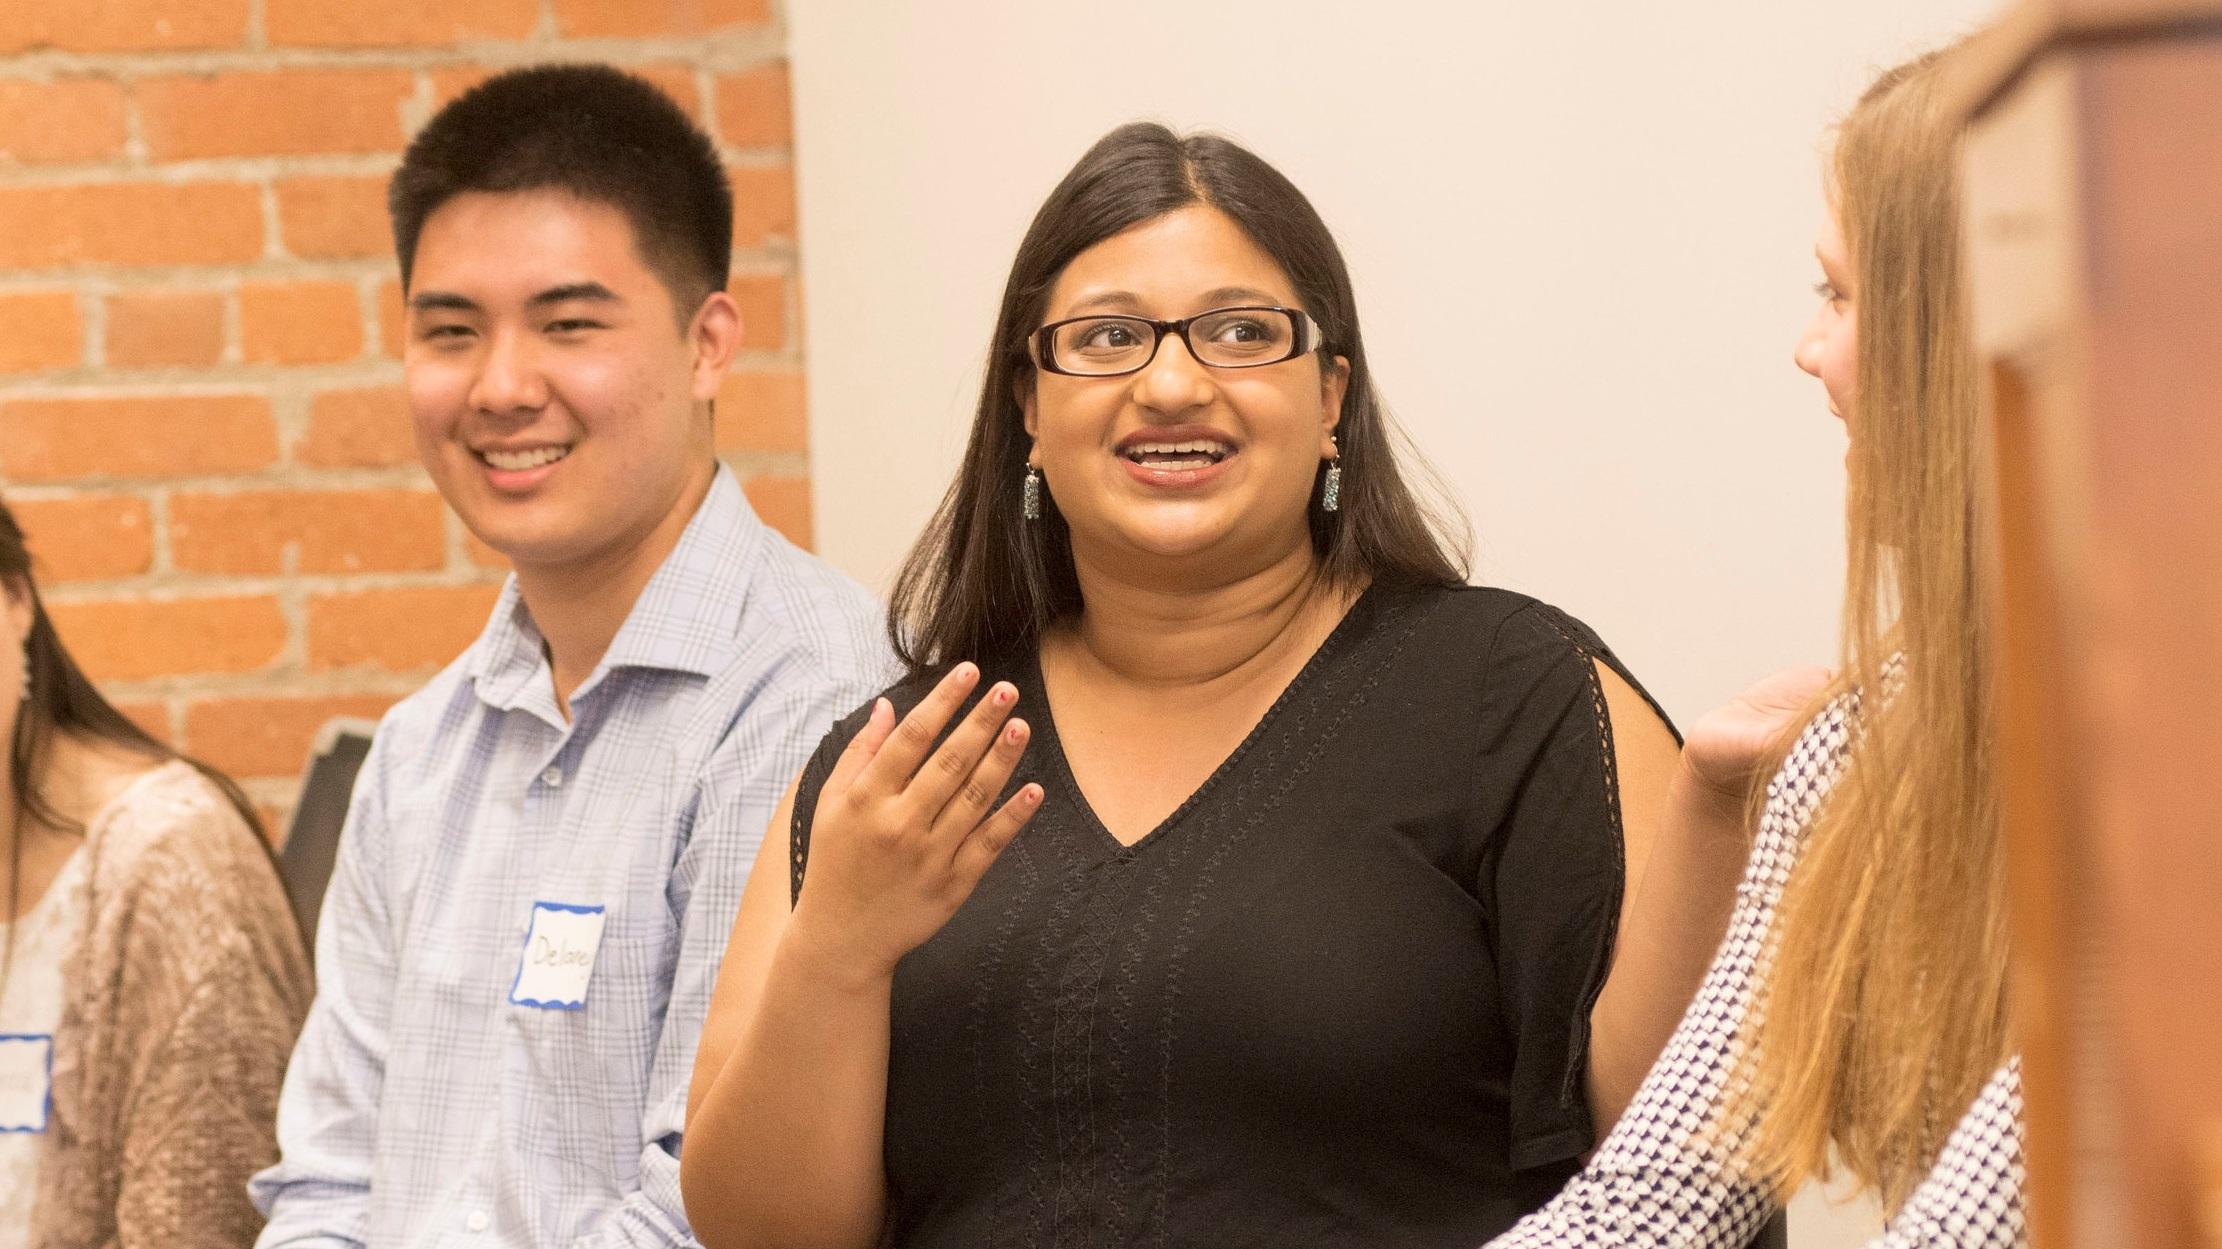 Graduating senior, Elena Gupta, shares her PRYDE Scholar experience with the new student cohort.